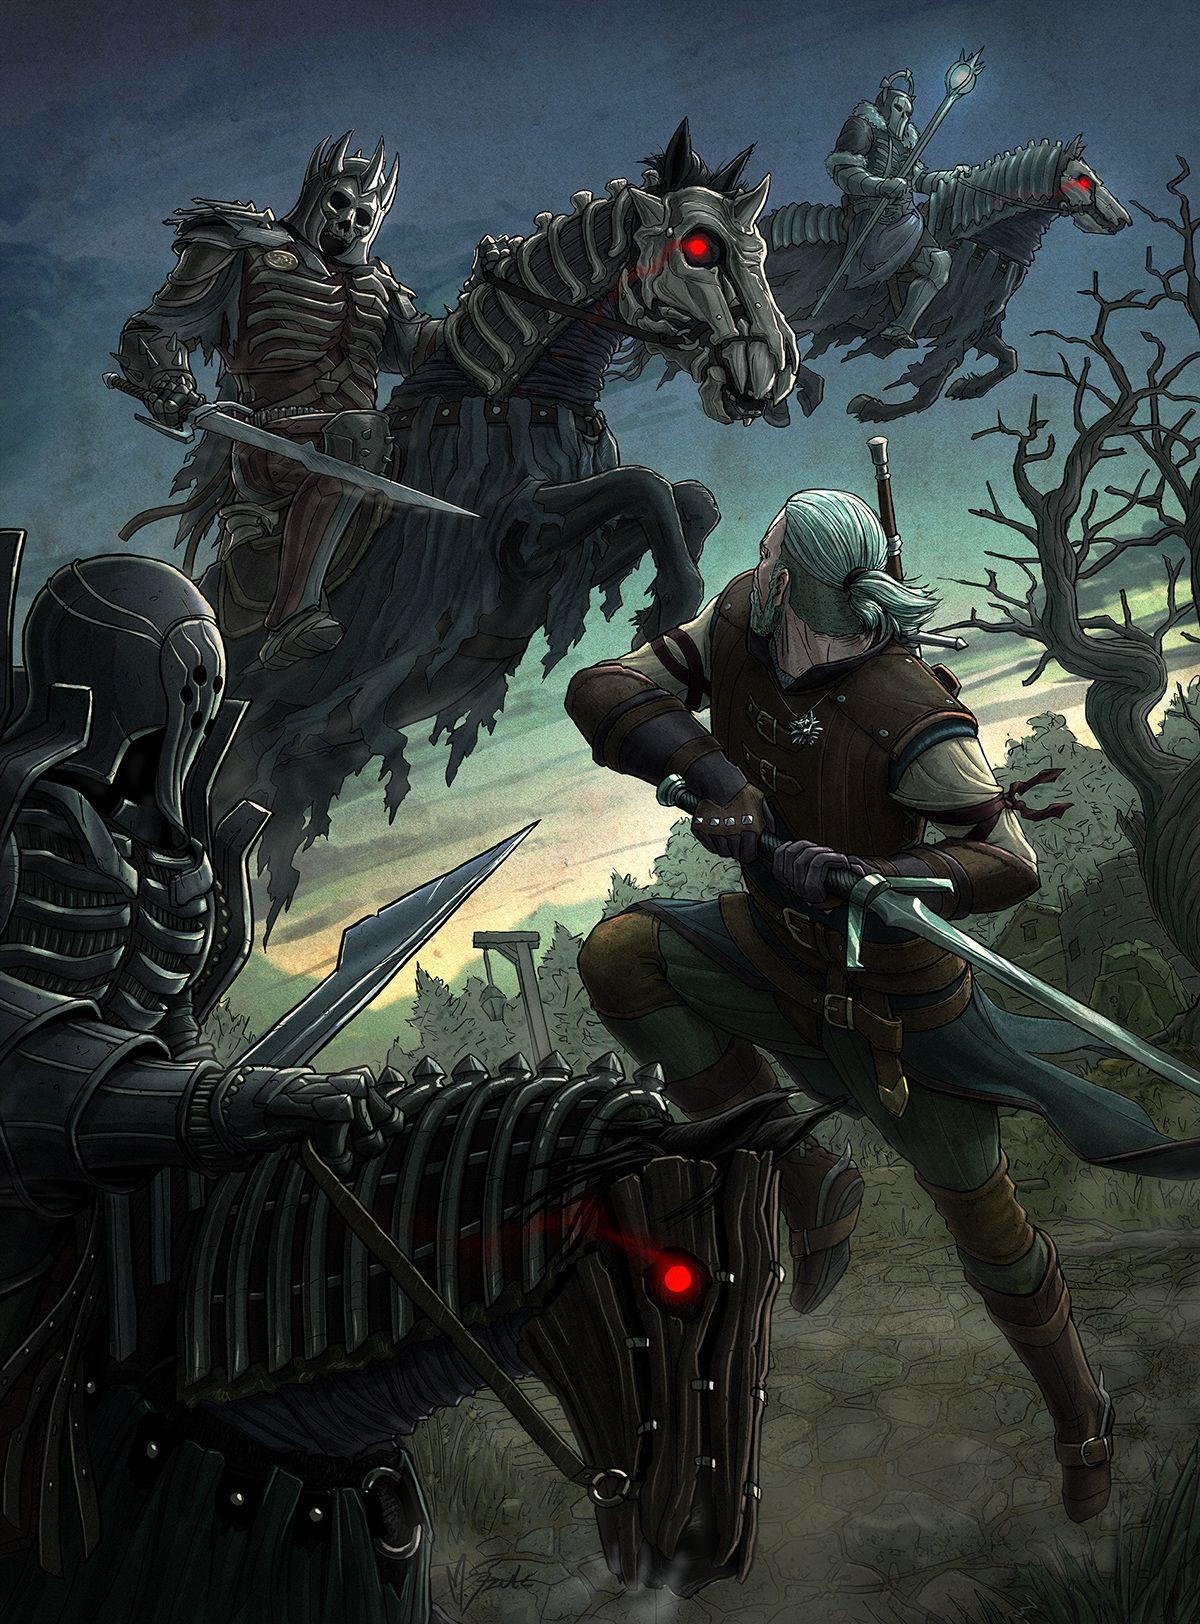 The Hunt Witcher 3 Fanart By Mariusz Szulc The Witcher The Witcher Game Witcher Art The witcher 3 wild hunt art